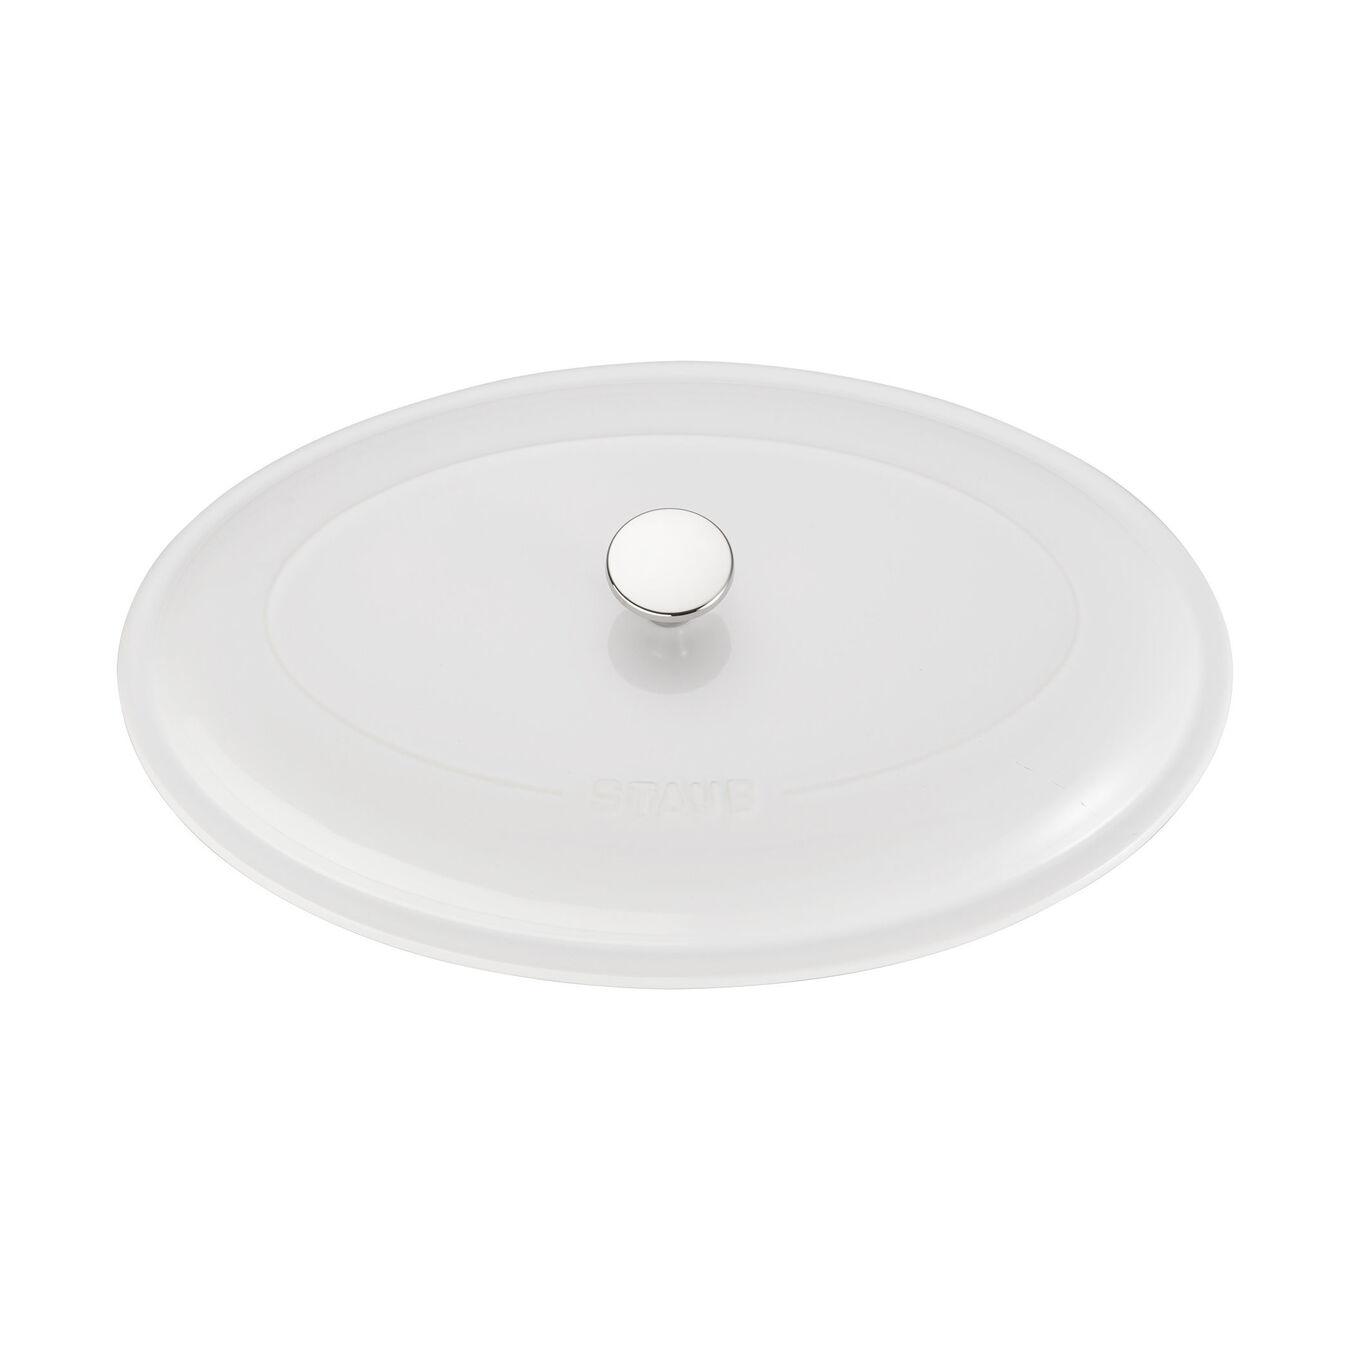 Ceramic Special shape bakeware, white,,large 4